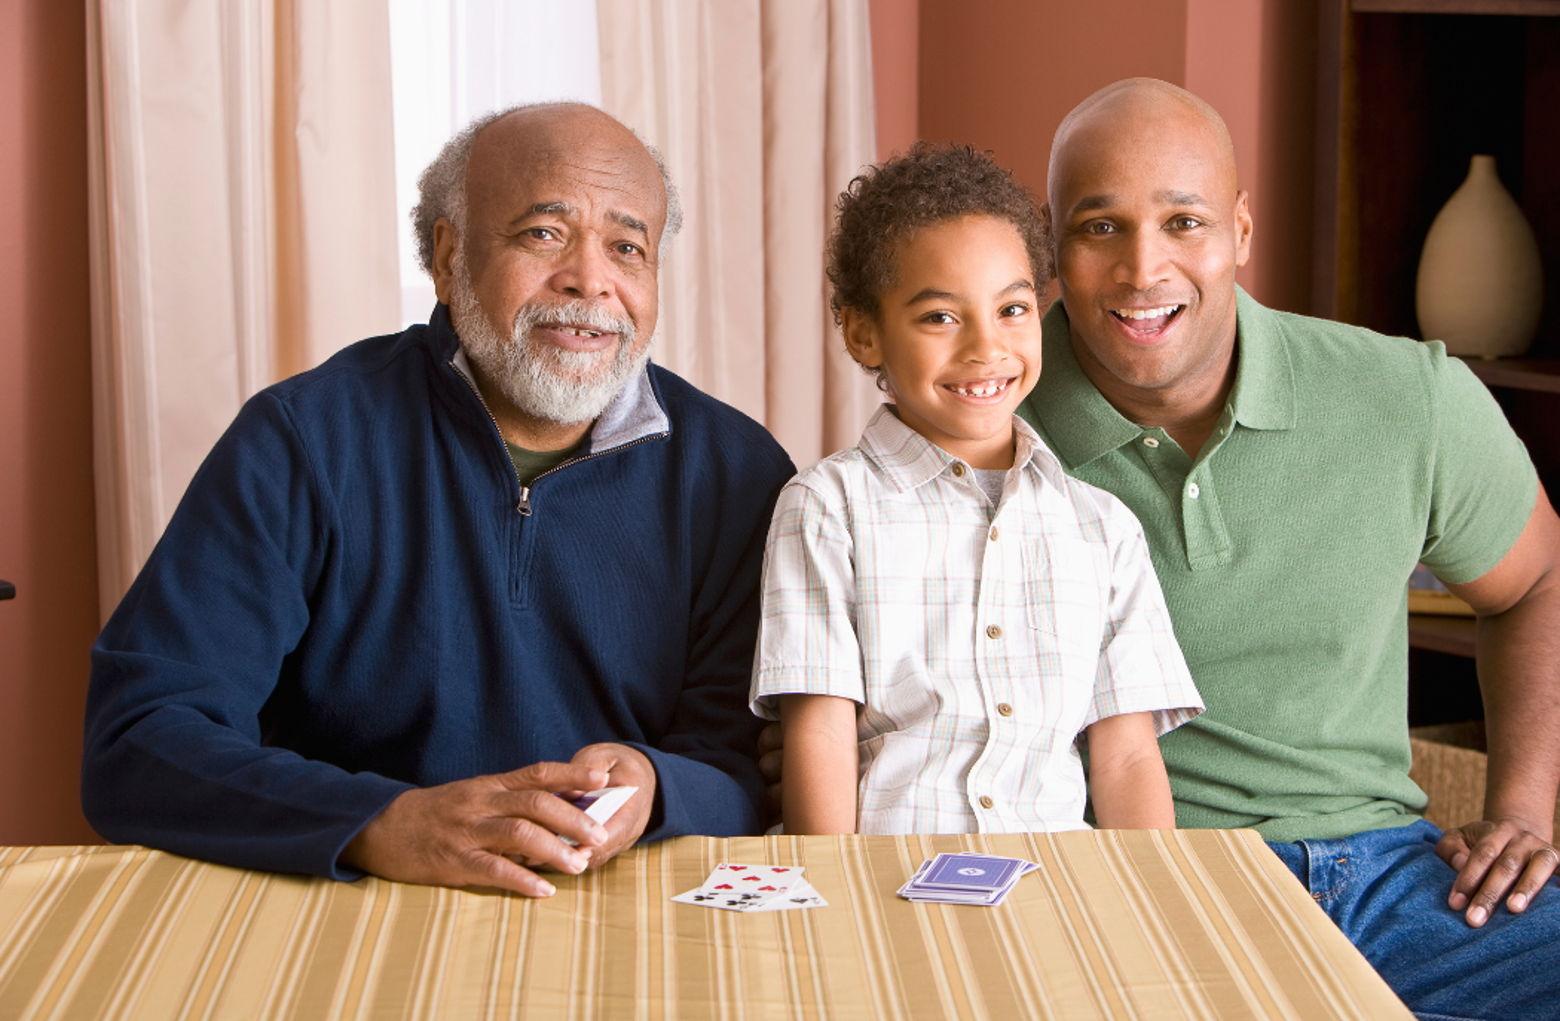 Image of three generations of men